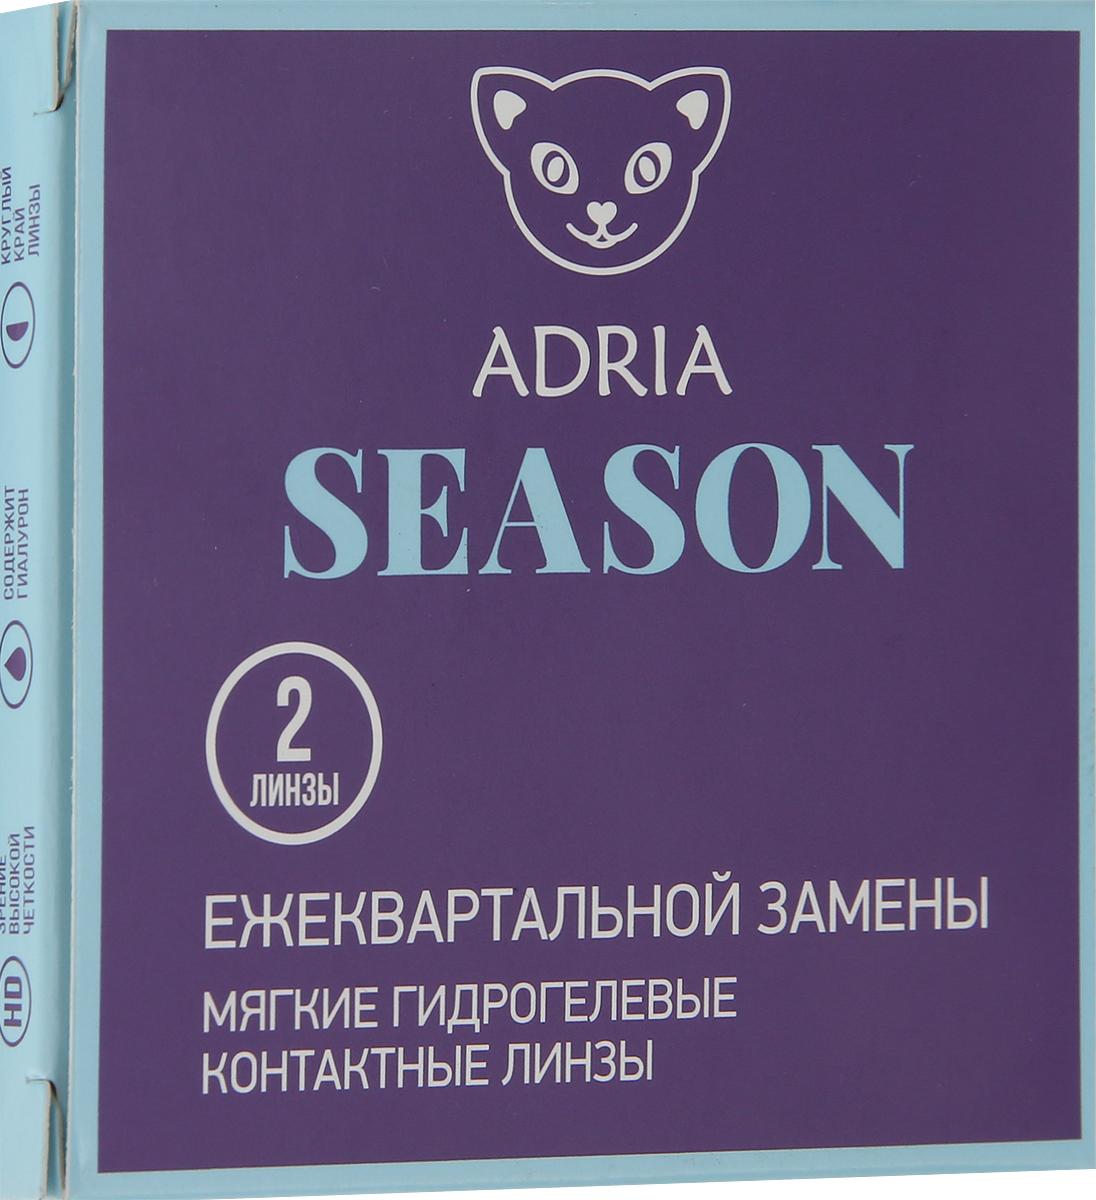 Adria Контактные линзы Morning Q38 / 2 шт / -5.50 / 8.6 / 14